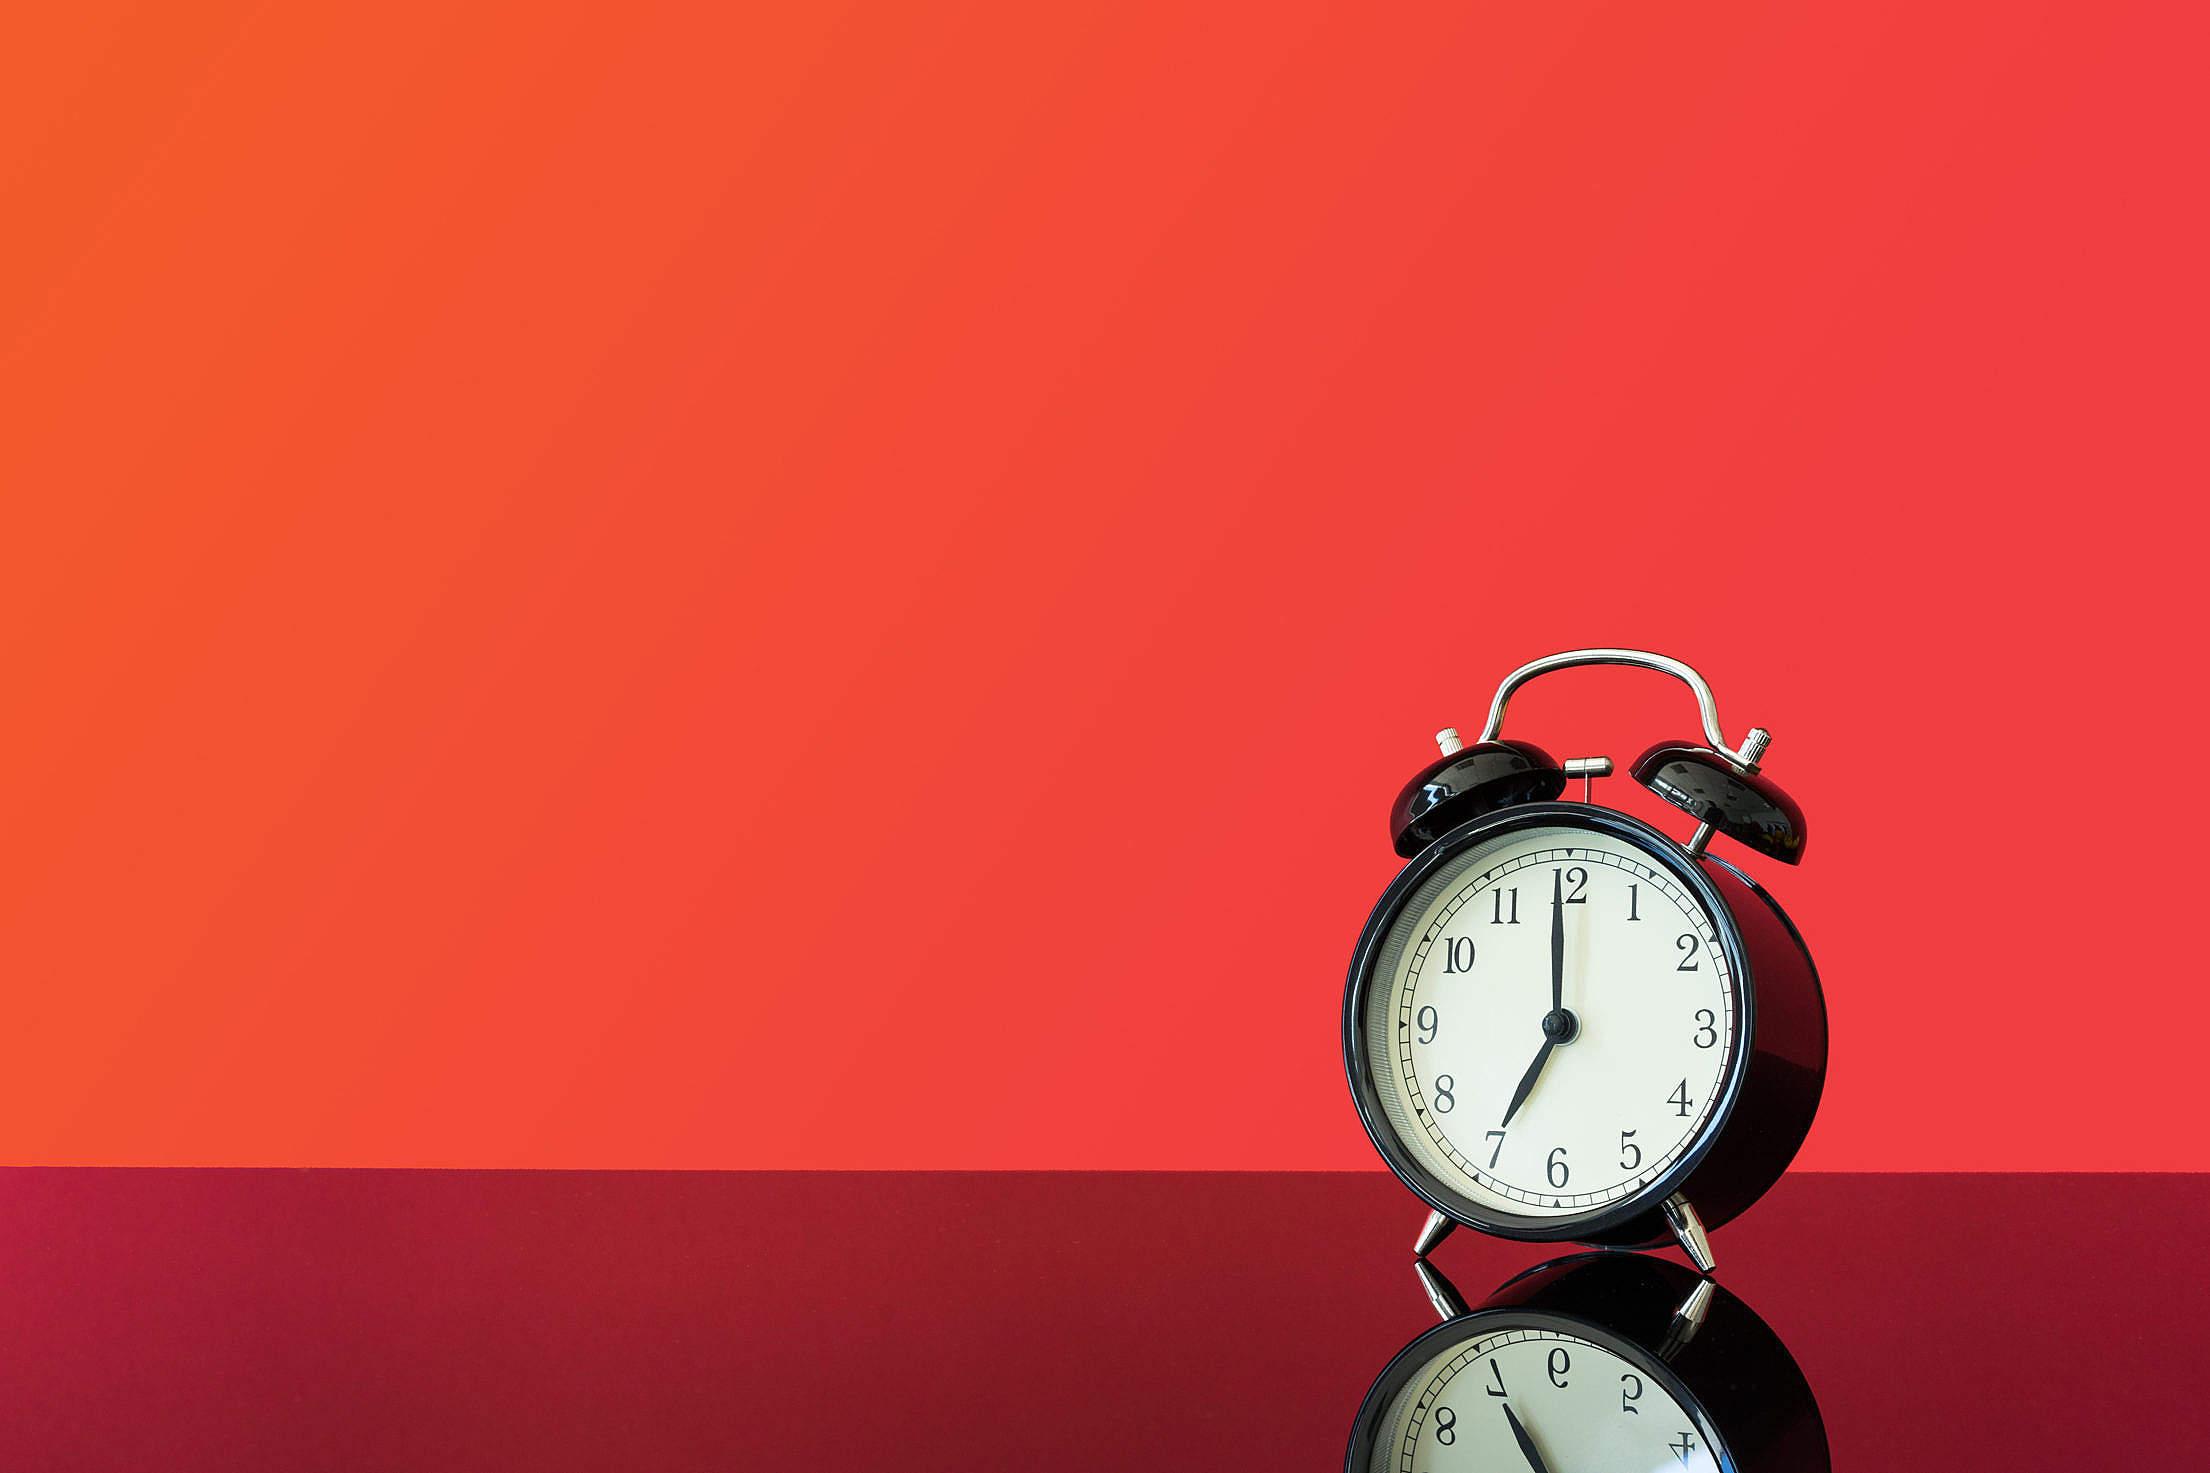 Vintage Alarm Clock Free Stock Photo